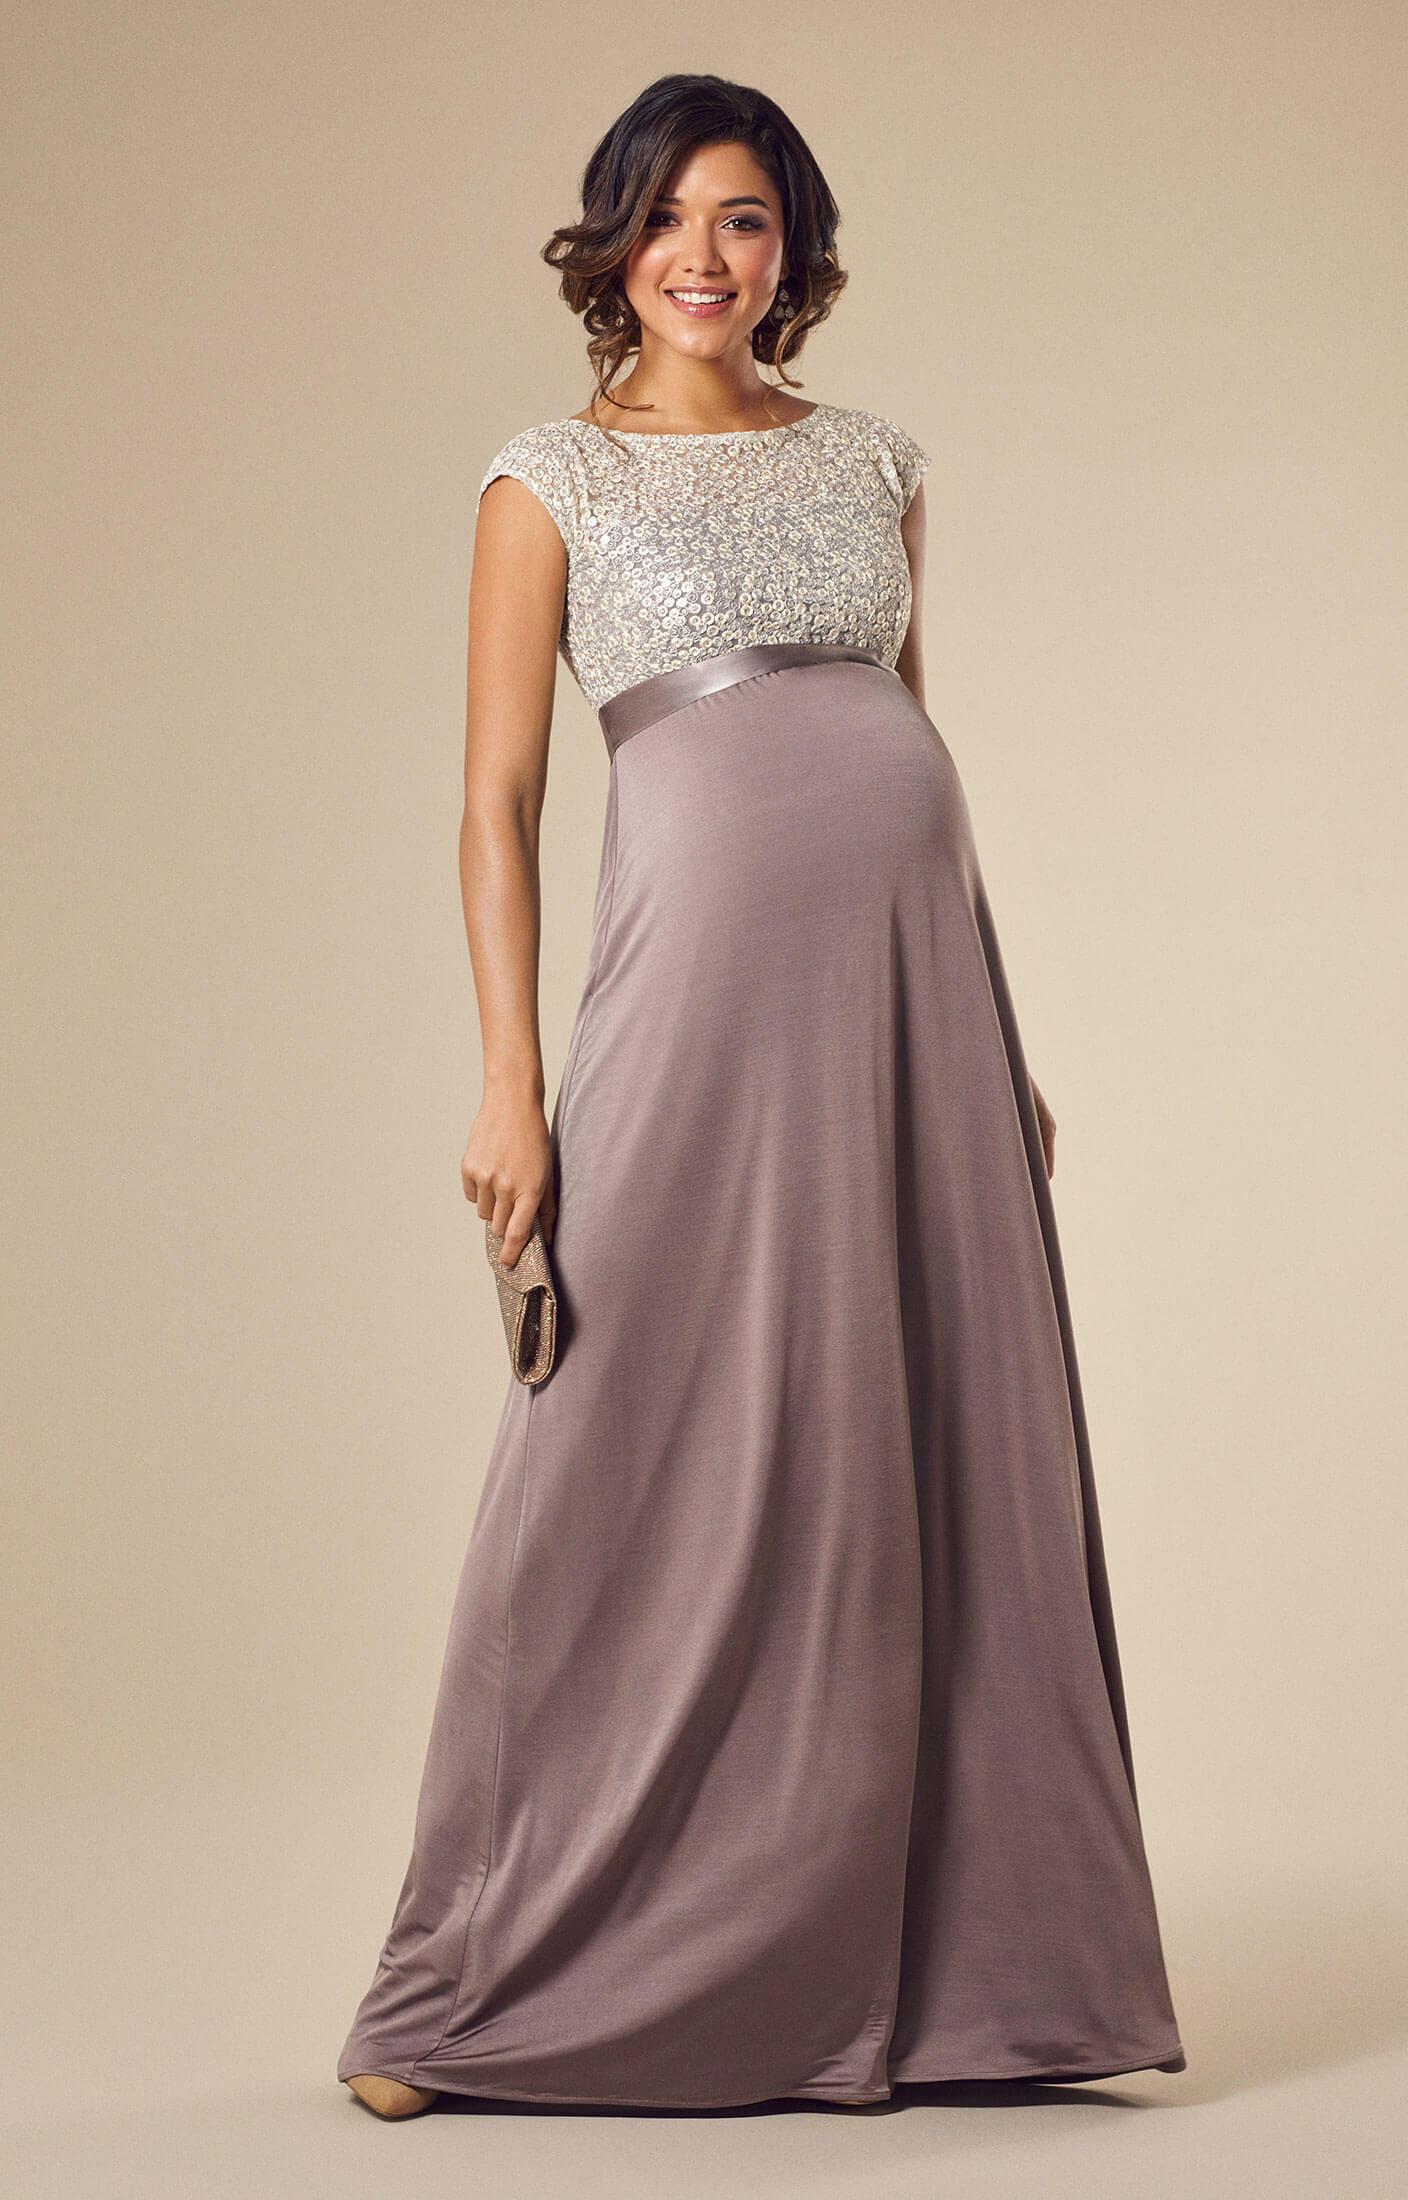 Mia Maternity Gown Dusky Truffle Maternity Wedding